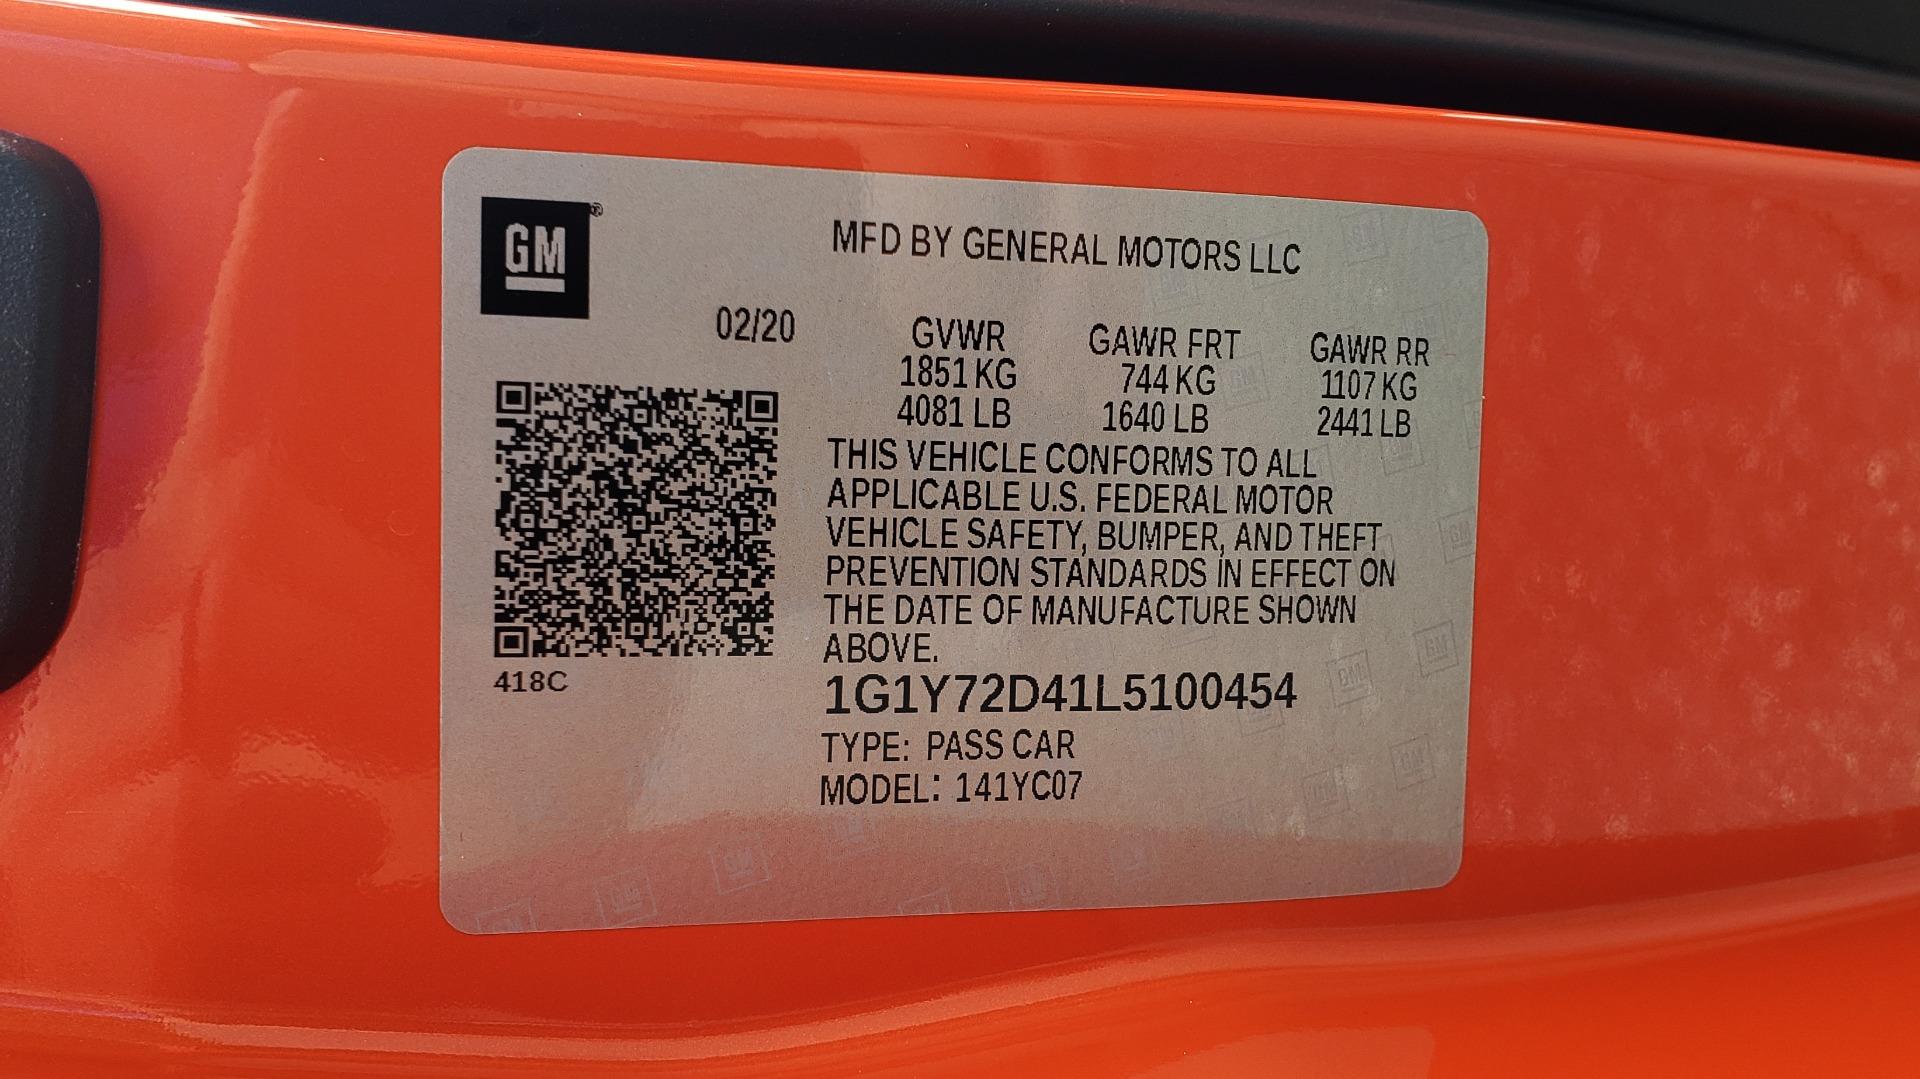 Used 2020 Chevrolet CORVETTE C8 STINGRAY 2LT / 6.2L V8 / 8-SPD AUTO / NAV / BOSE / REARVIEW / DATA RECOR for sale Sold at Formula Imports in Charlotte NC 28227 91